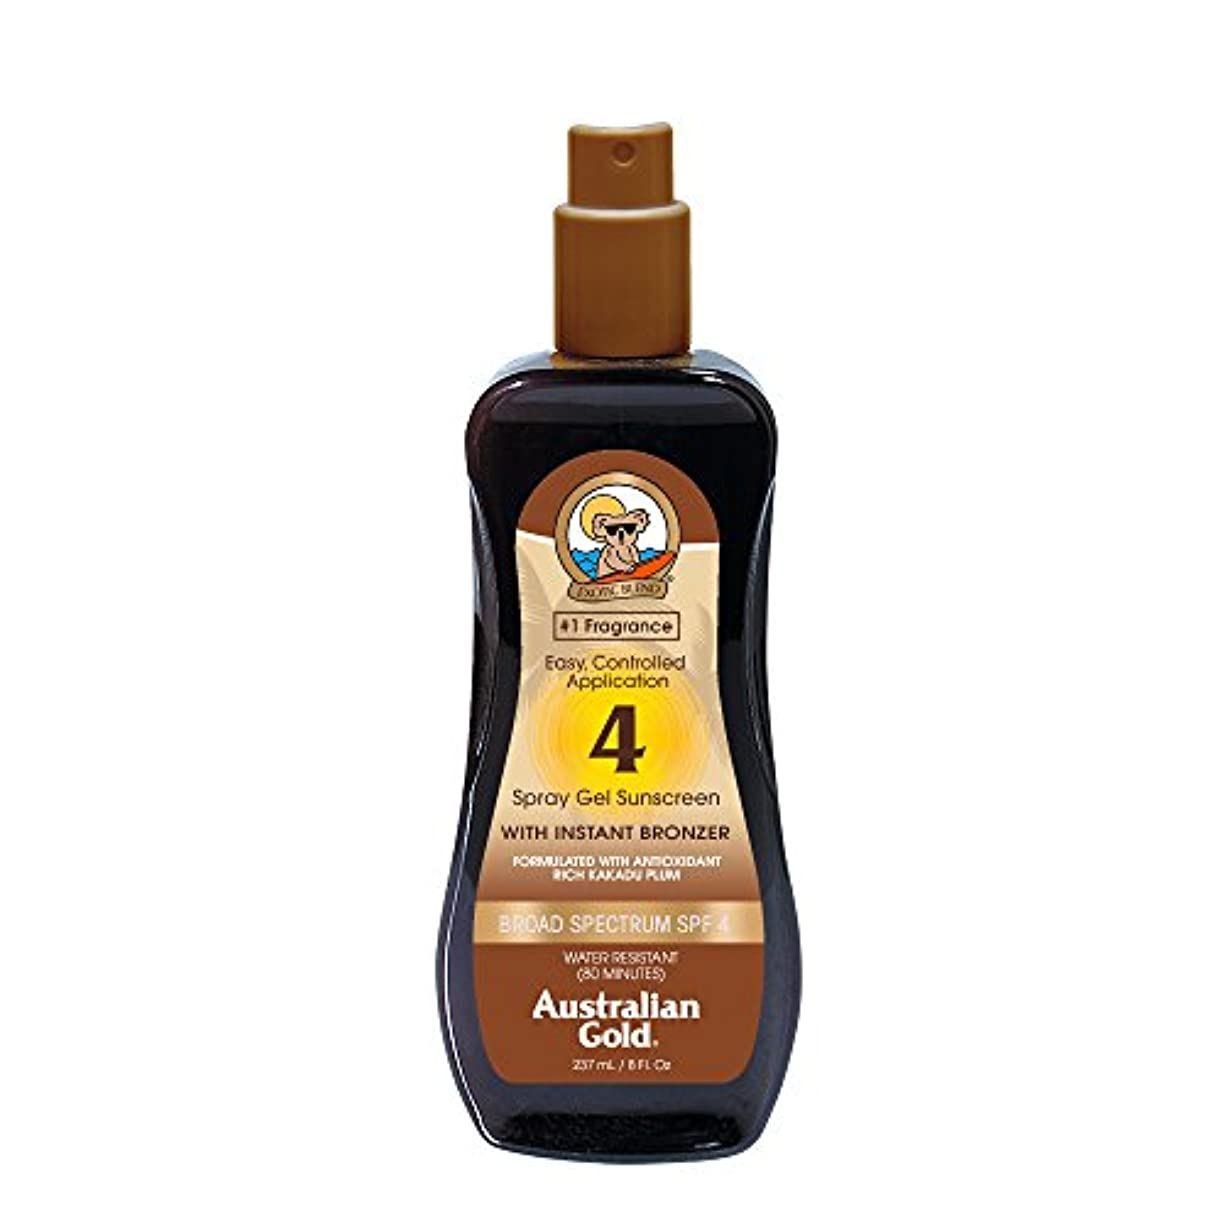 Australian Gold Spray Gel Sunscreen Broad Spectrum SPF 4 with Instant Bronzer 237ml/8oz並行輸入品